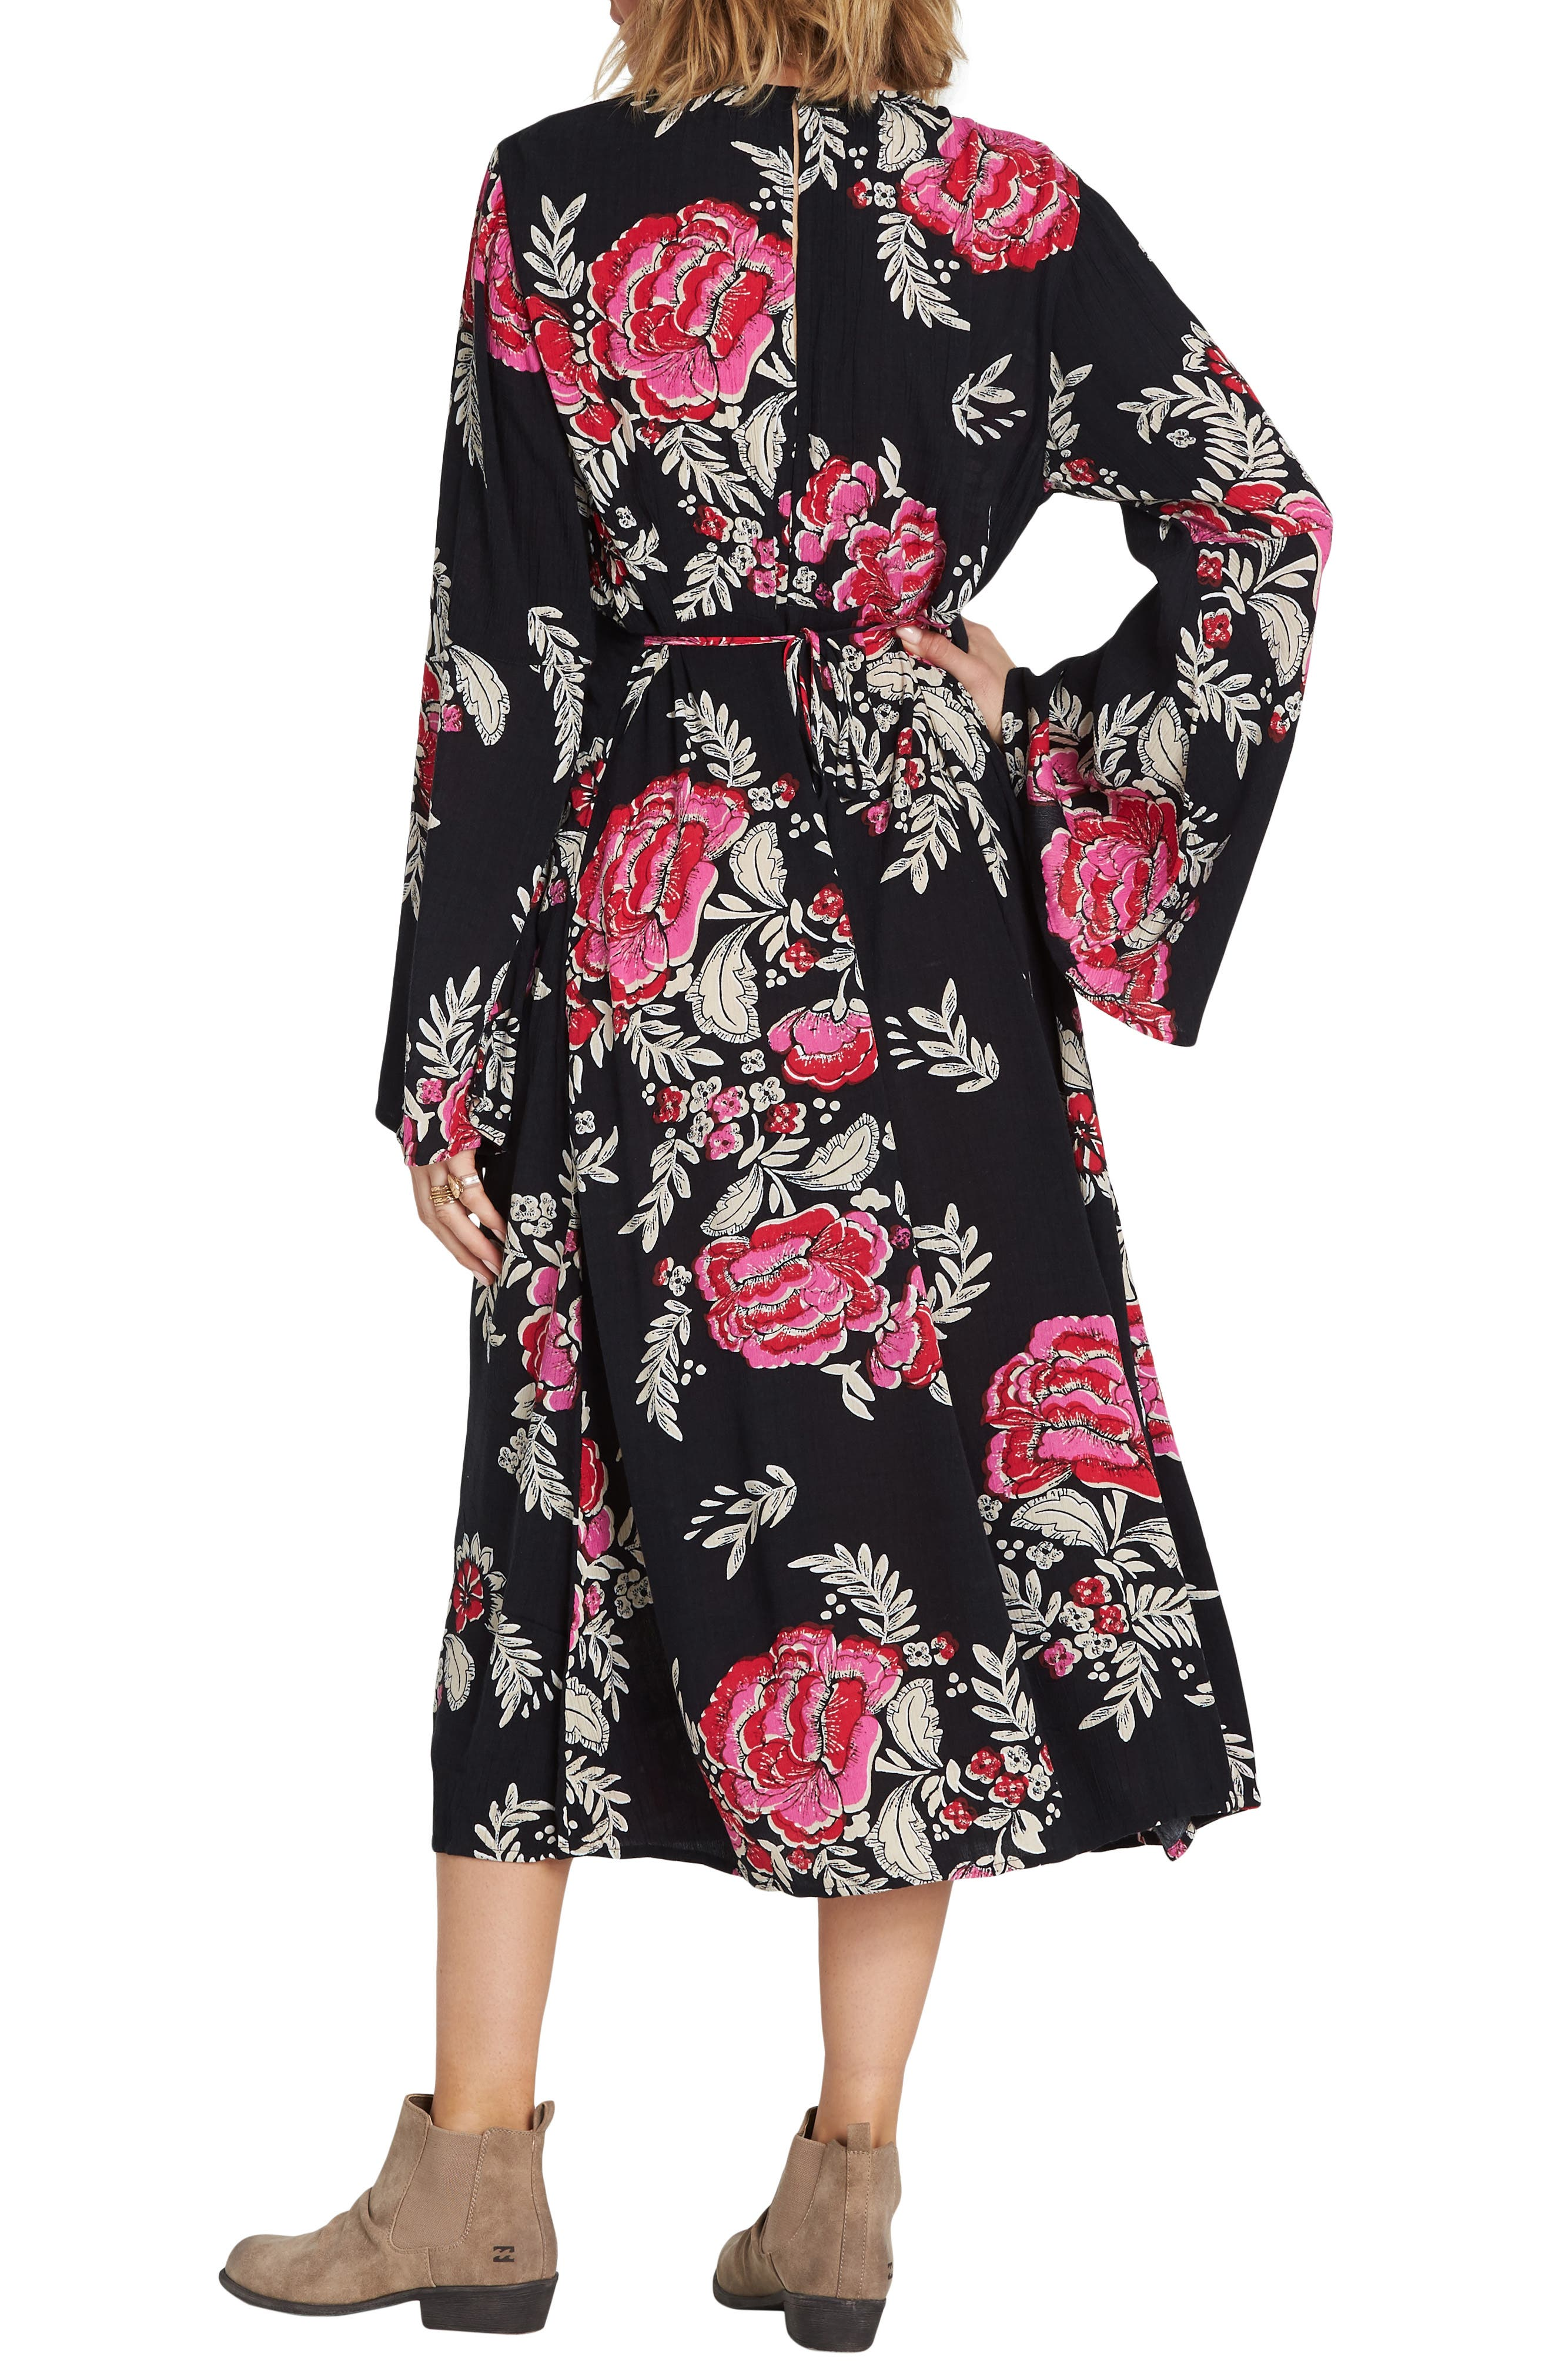 Floral Whispers Floral Midi Dress,                             Alternate thumbnail 2, color,                             BLACK